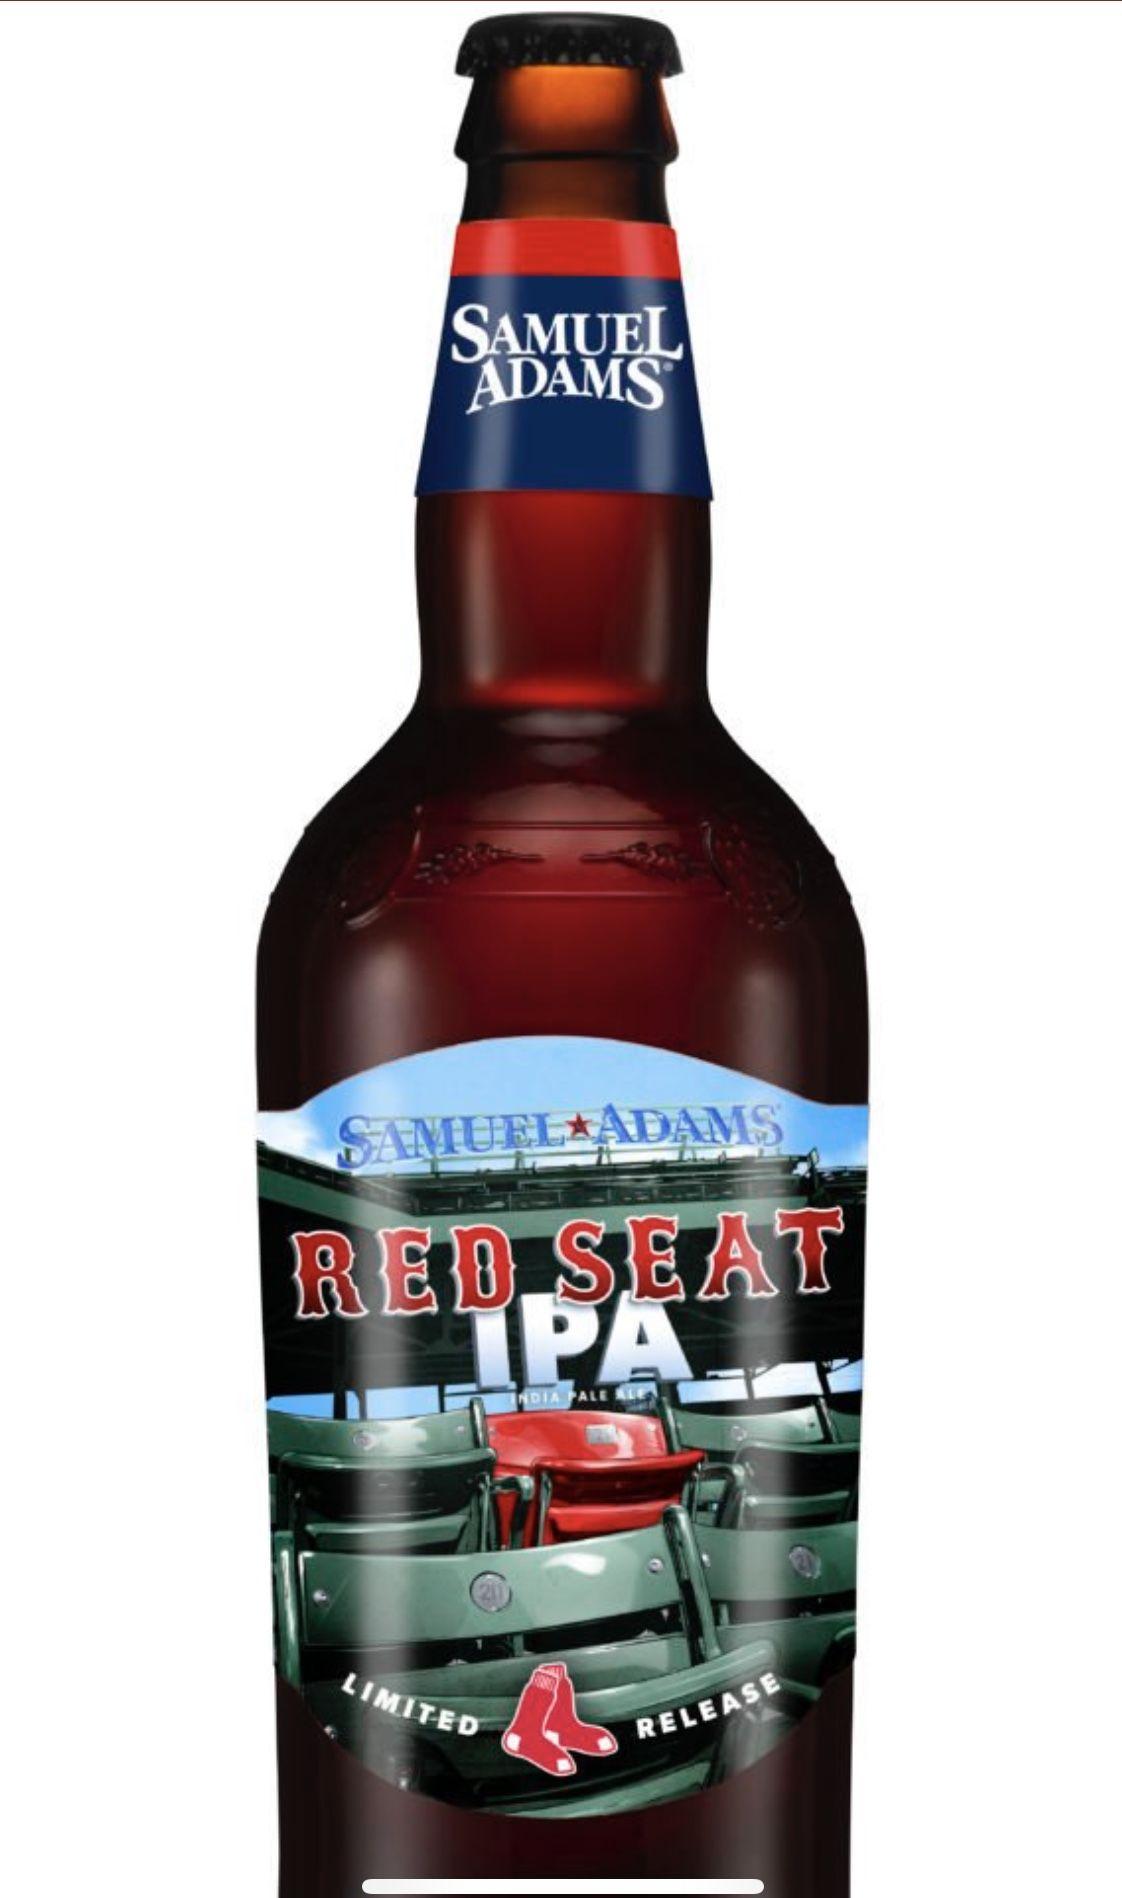 Sam Adams Red Sox Fenway Beer Red Sox Baby Red Sox Baseball Red Sox Nation